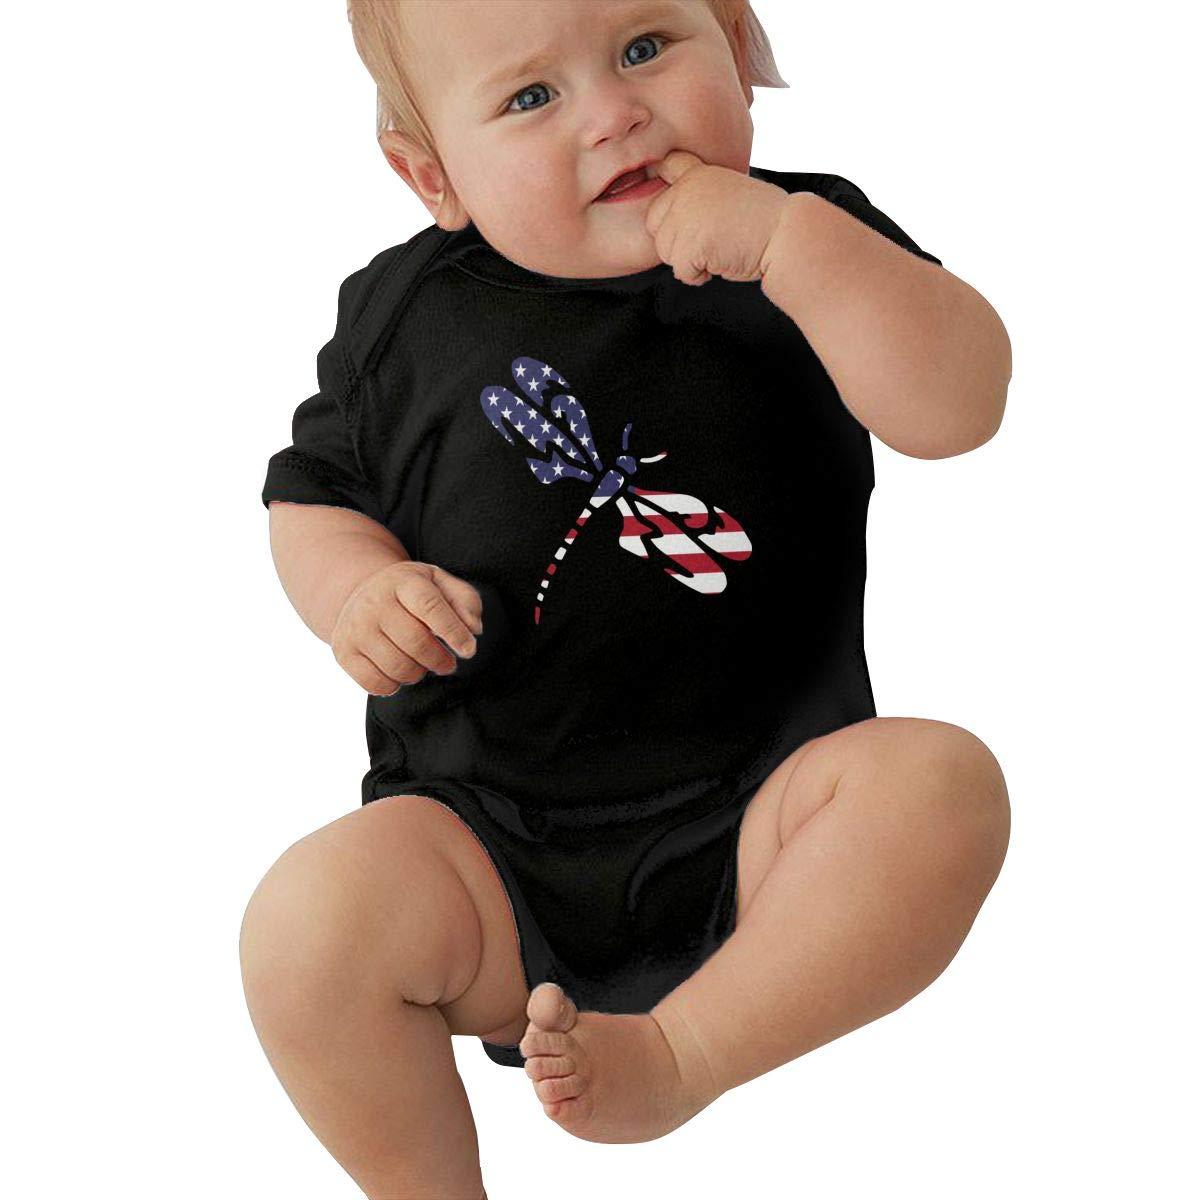 Newborn Baby Girl Boy Tribal Dragonfly USA Flag Romper Romper Jumpsuit Short Sleeved Bodysuit Tops Clothes